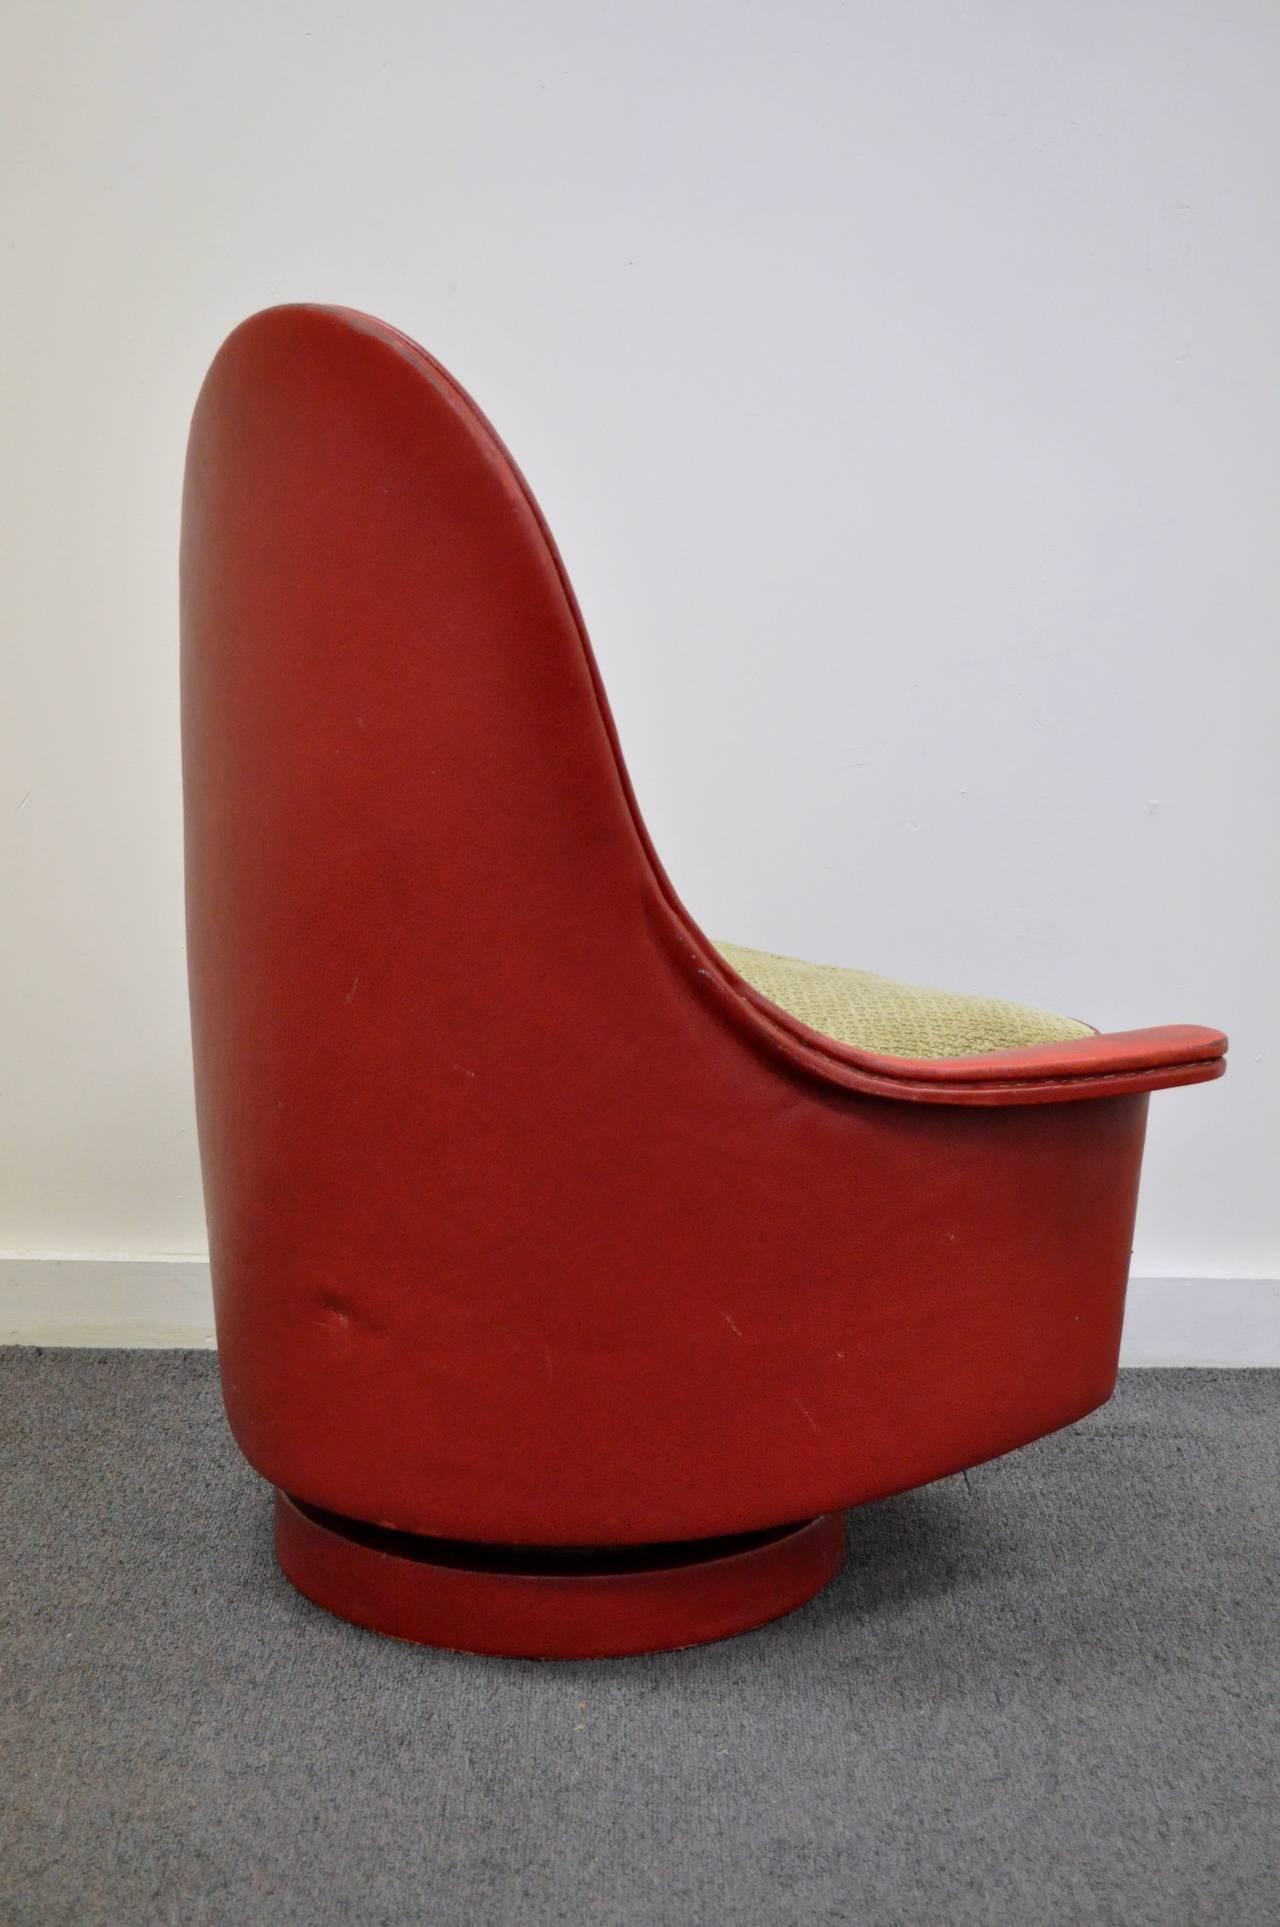 Mid-Century Modern Petite Sculptural Milo Baughman Tear Drop Swivel and Tilt Slipper or Club Chair For Sale